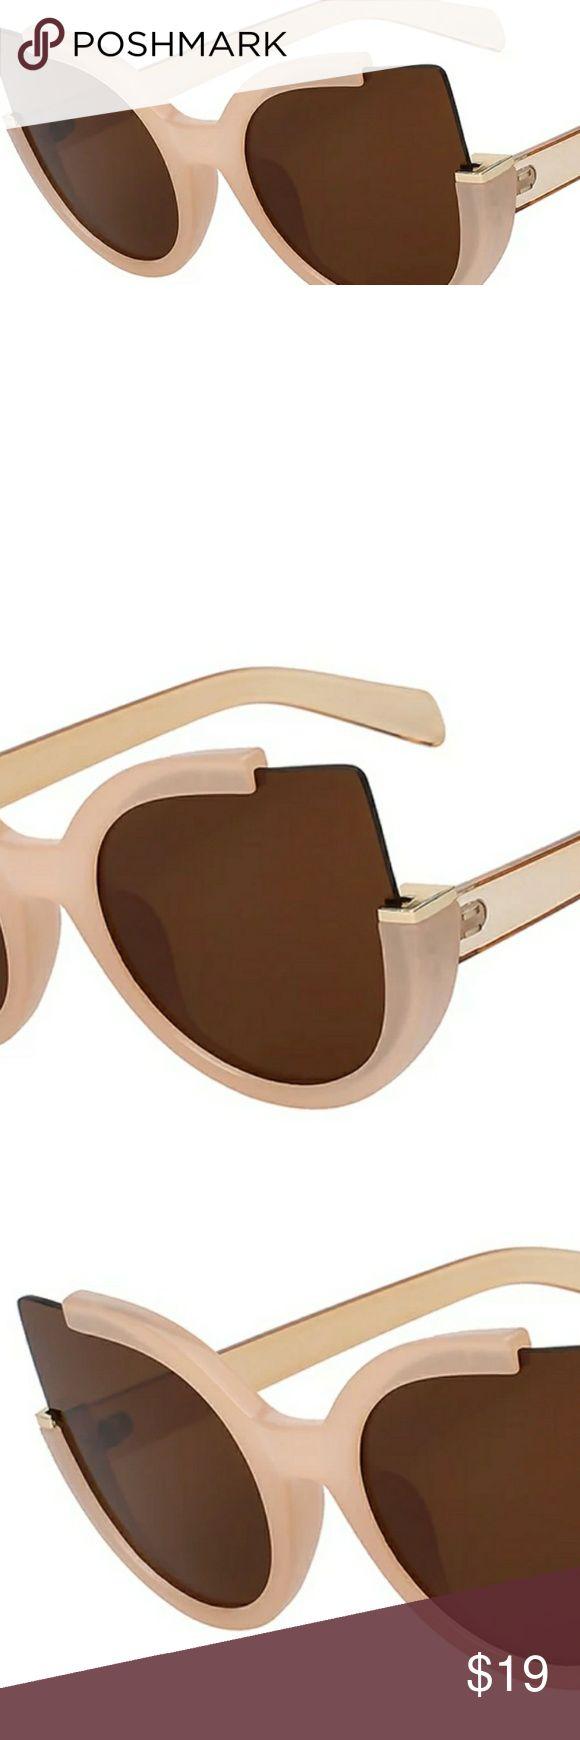 XIU Round Shade Summer Fashion Sunglasses Women Vi XIU Round Shade Summer Fashion Sunglasses Women Vintage Brand Designer Glasses For Ladies Gafas Retro Oculos UV400 xiu Accessories Glasses #womensfashionretroaccessories #womensfashionretrosummer